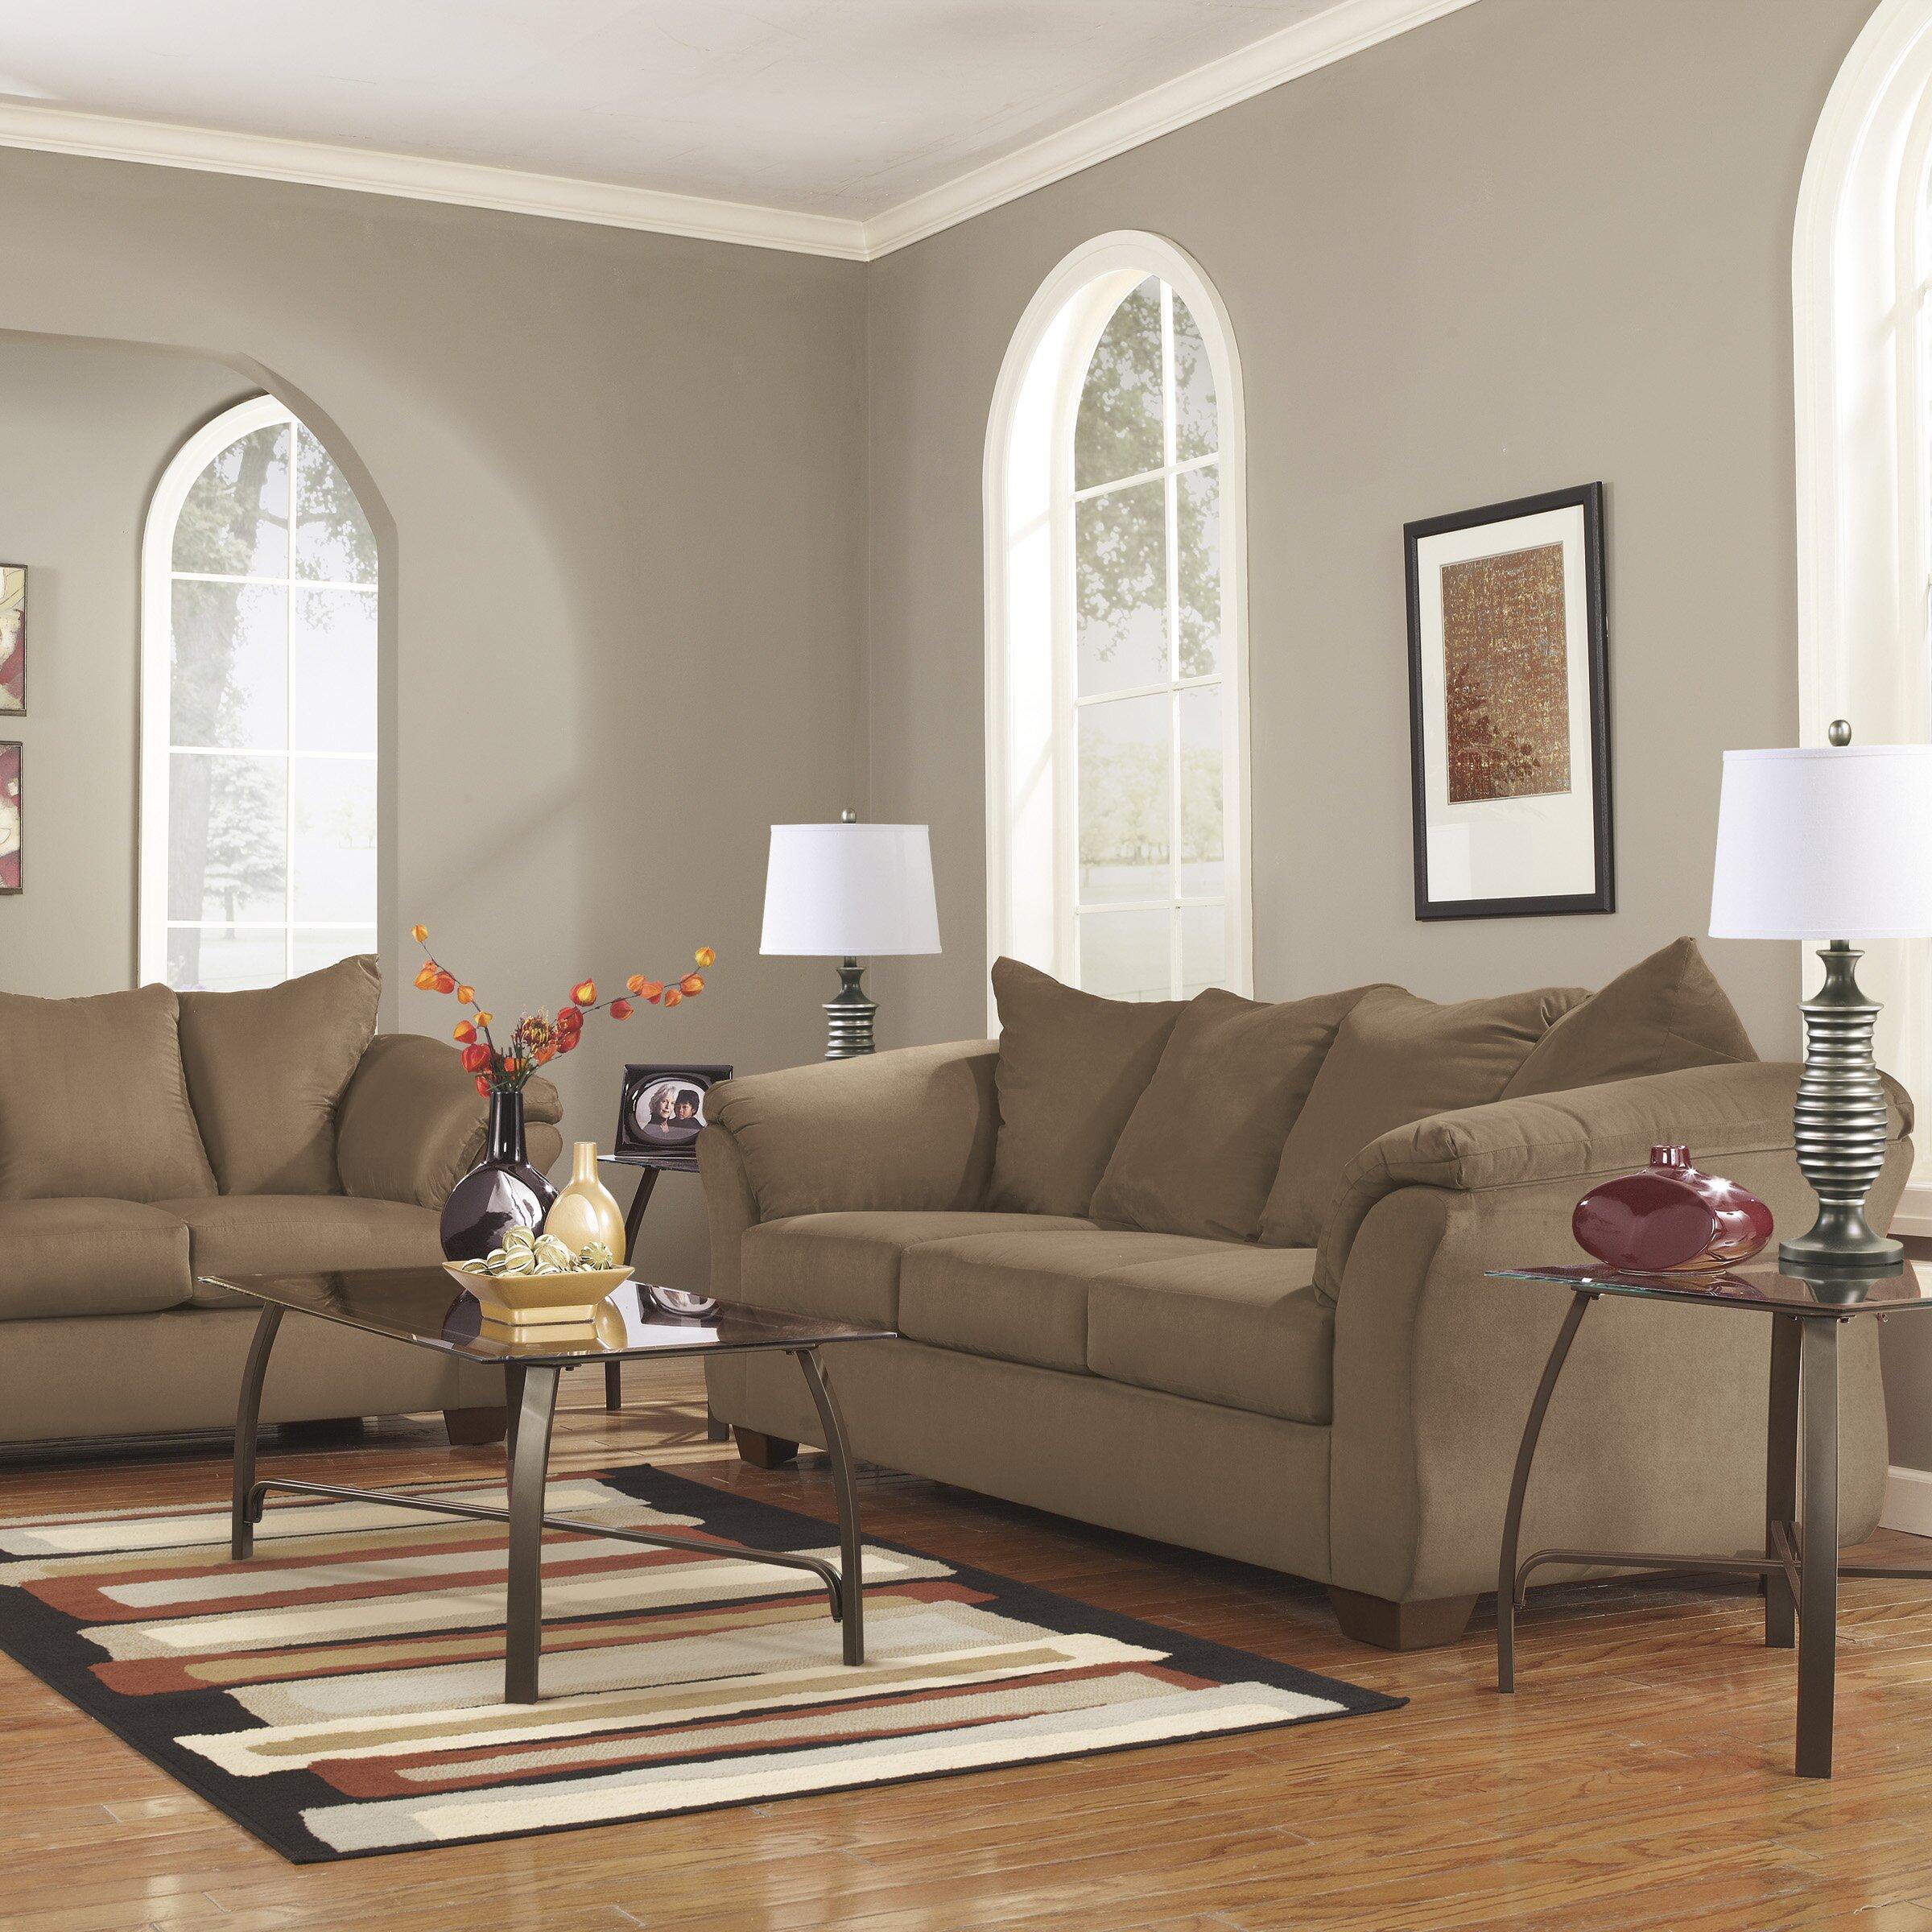 Sectional Sofa In Huntsville Al: Huntsville Sofa